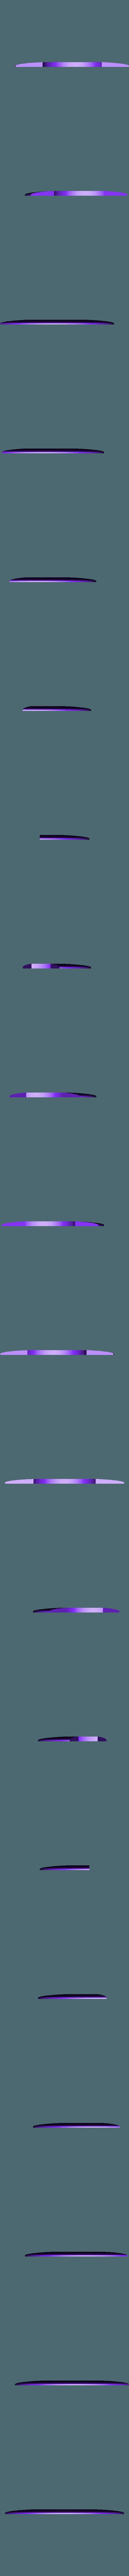 ts_gelb1.stl Download free STL file Minion door spyhole cover • 3D print design, uepsie